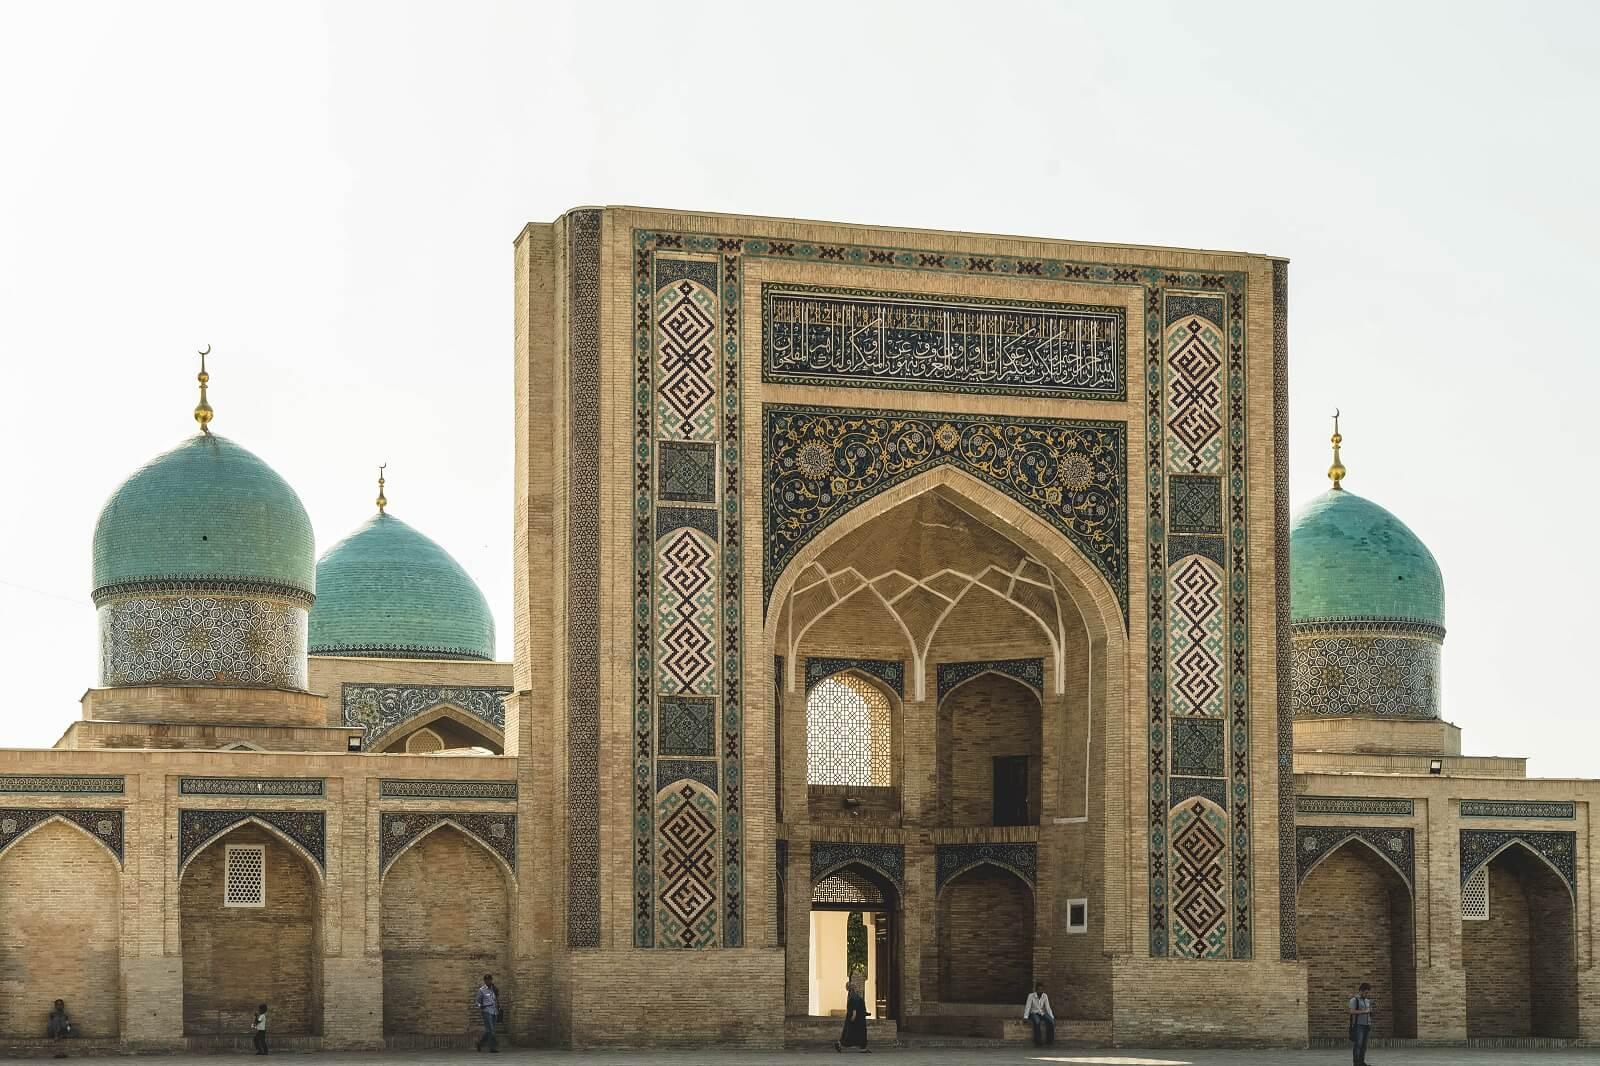 Central Asia, Silk Road Tour